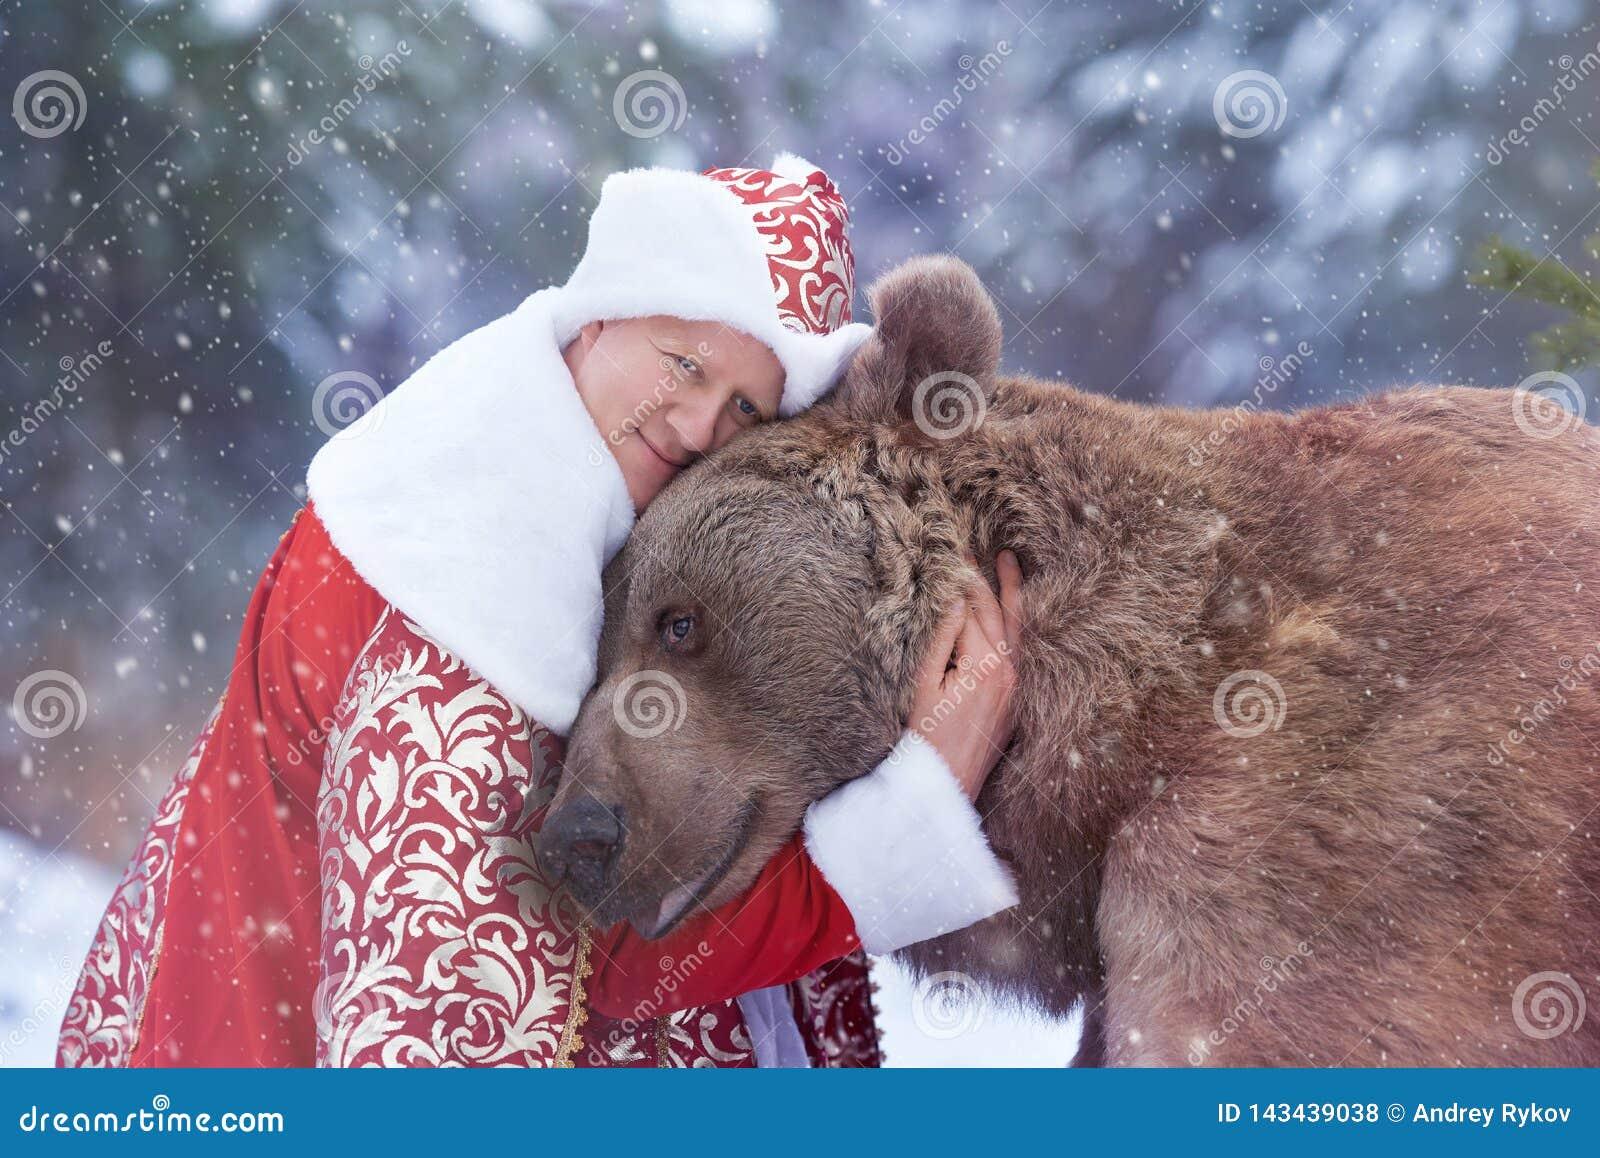 Mannen kramar brunbjörnen i julhelgdagsafton